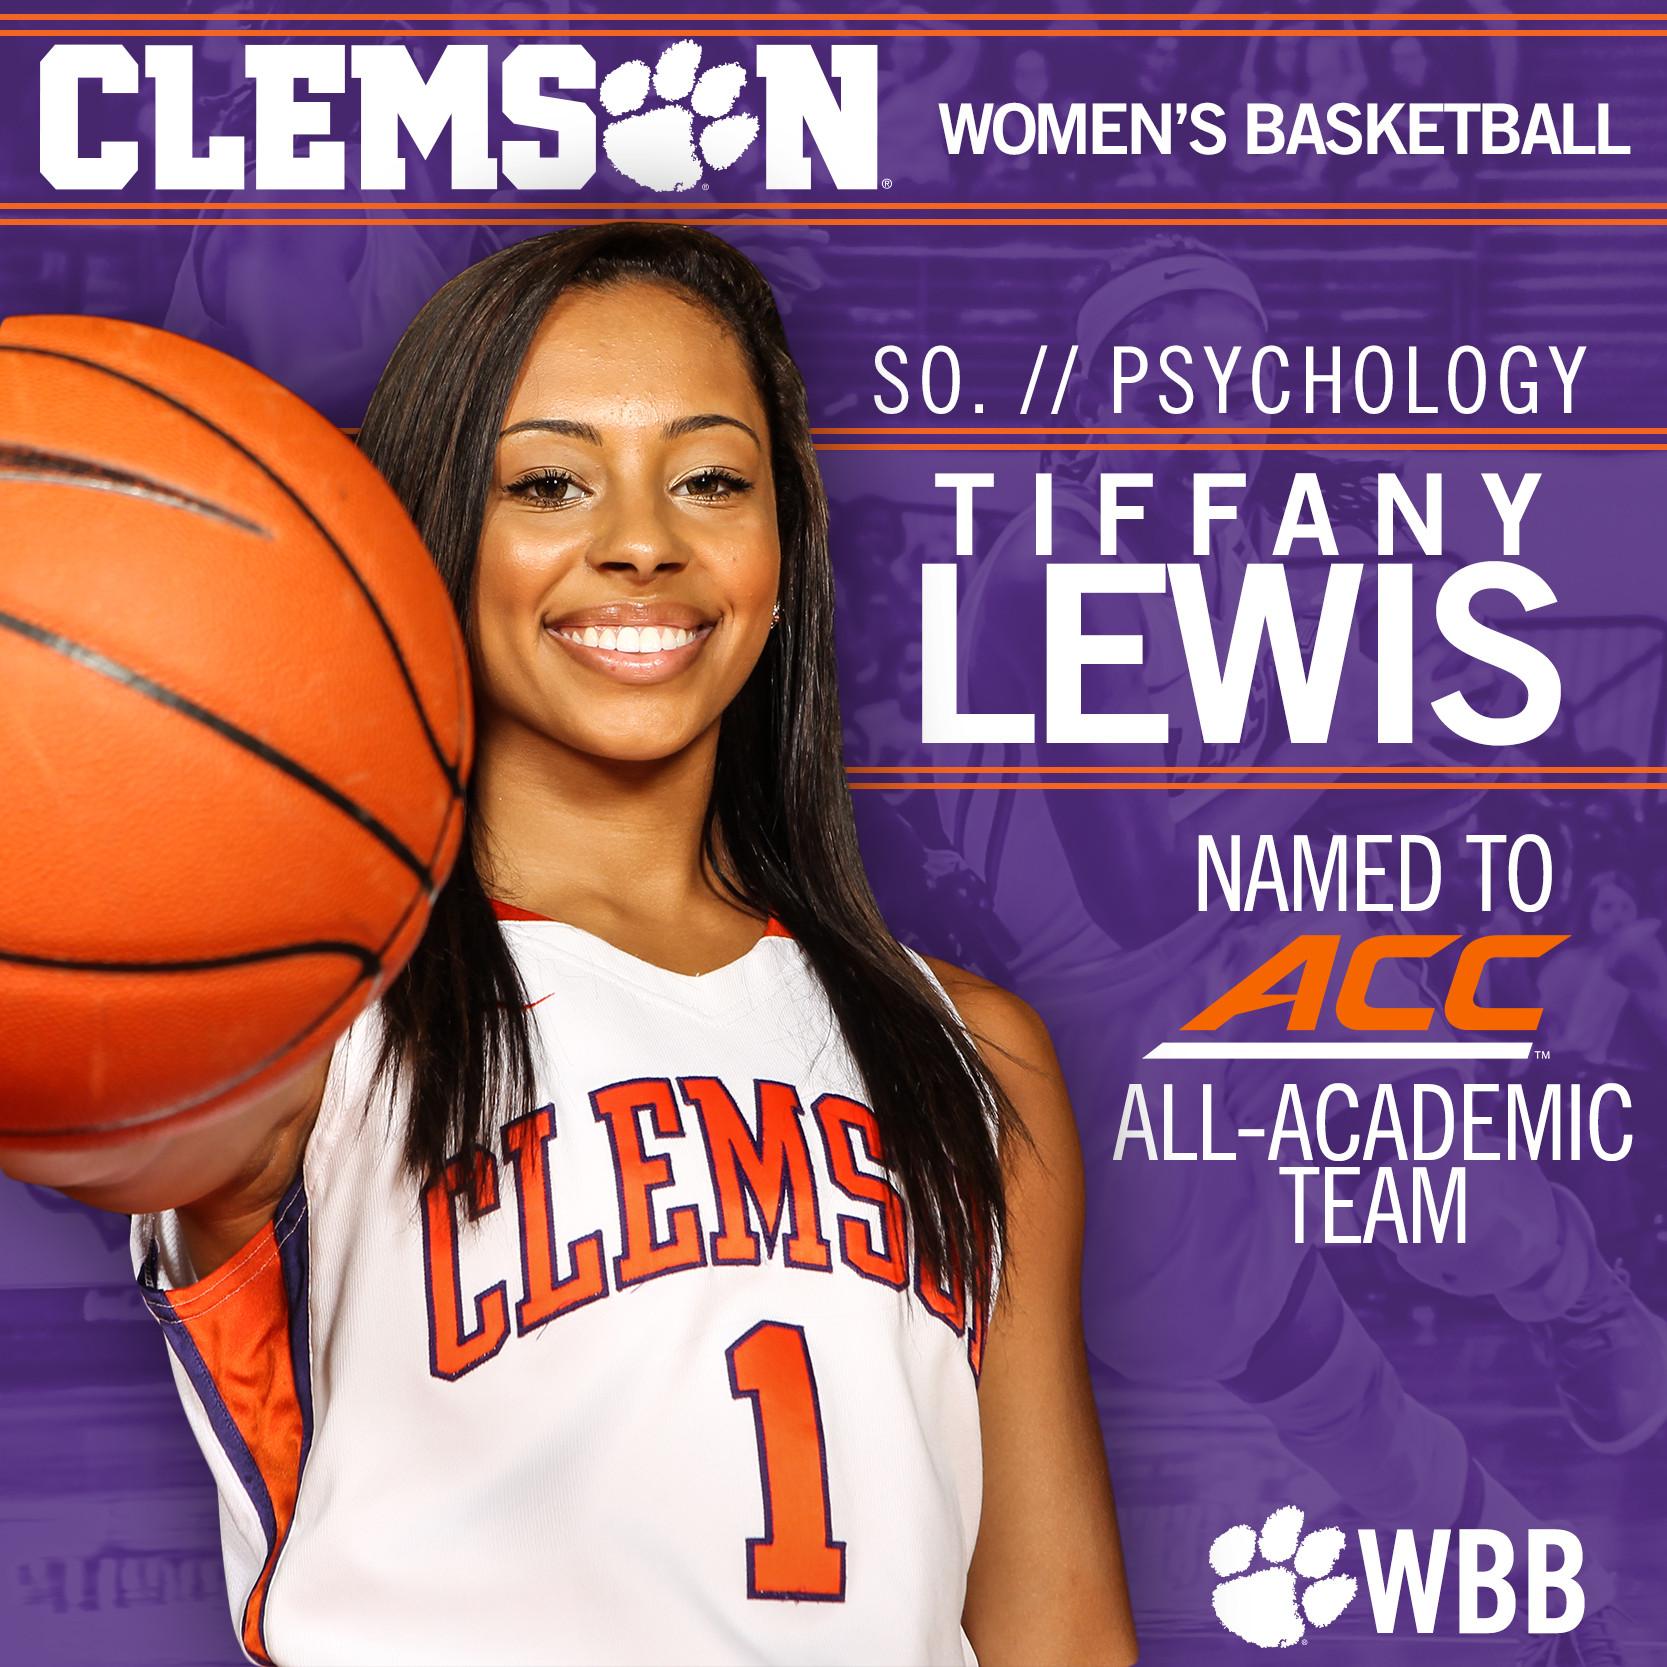 Tiffany Lewis named Academic All-ACC